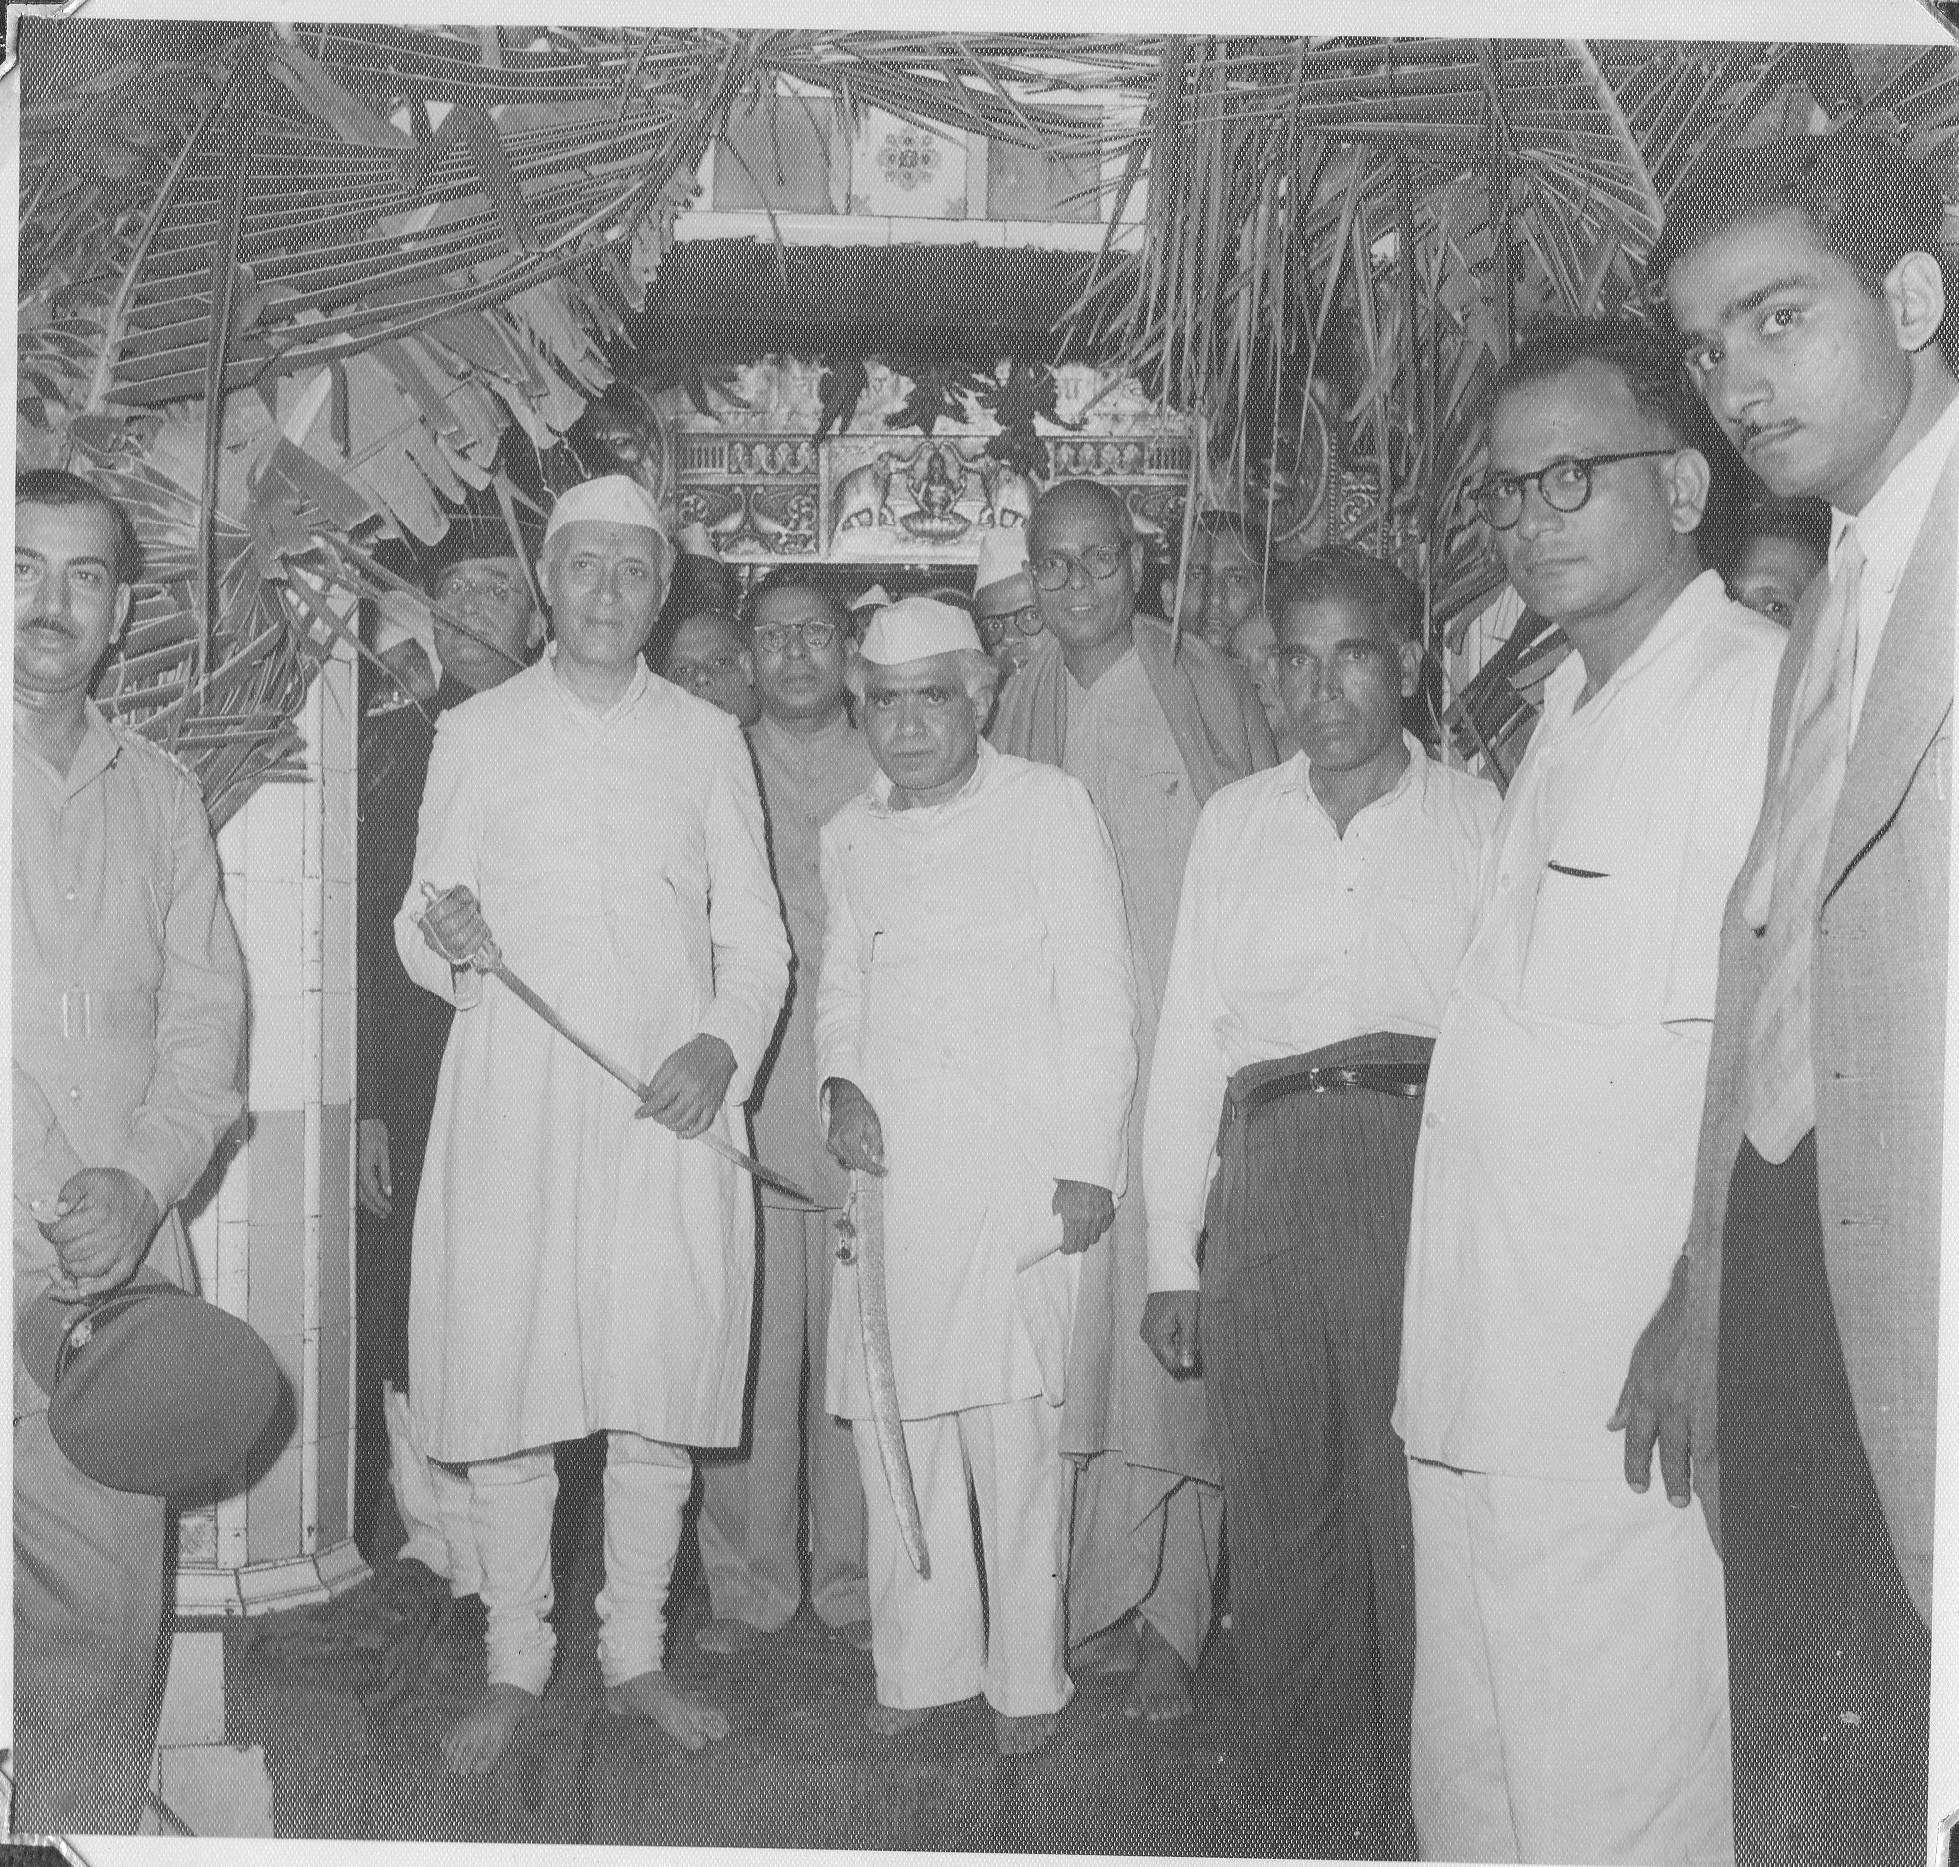 With Pandit Jawaharlal Nehru